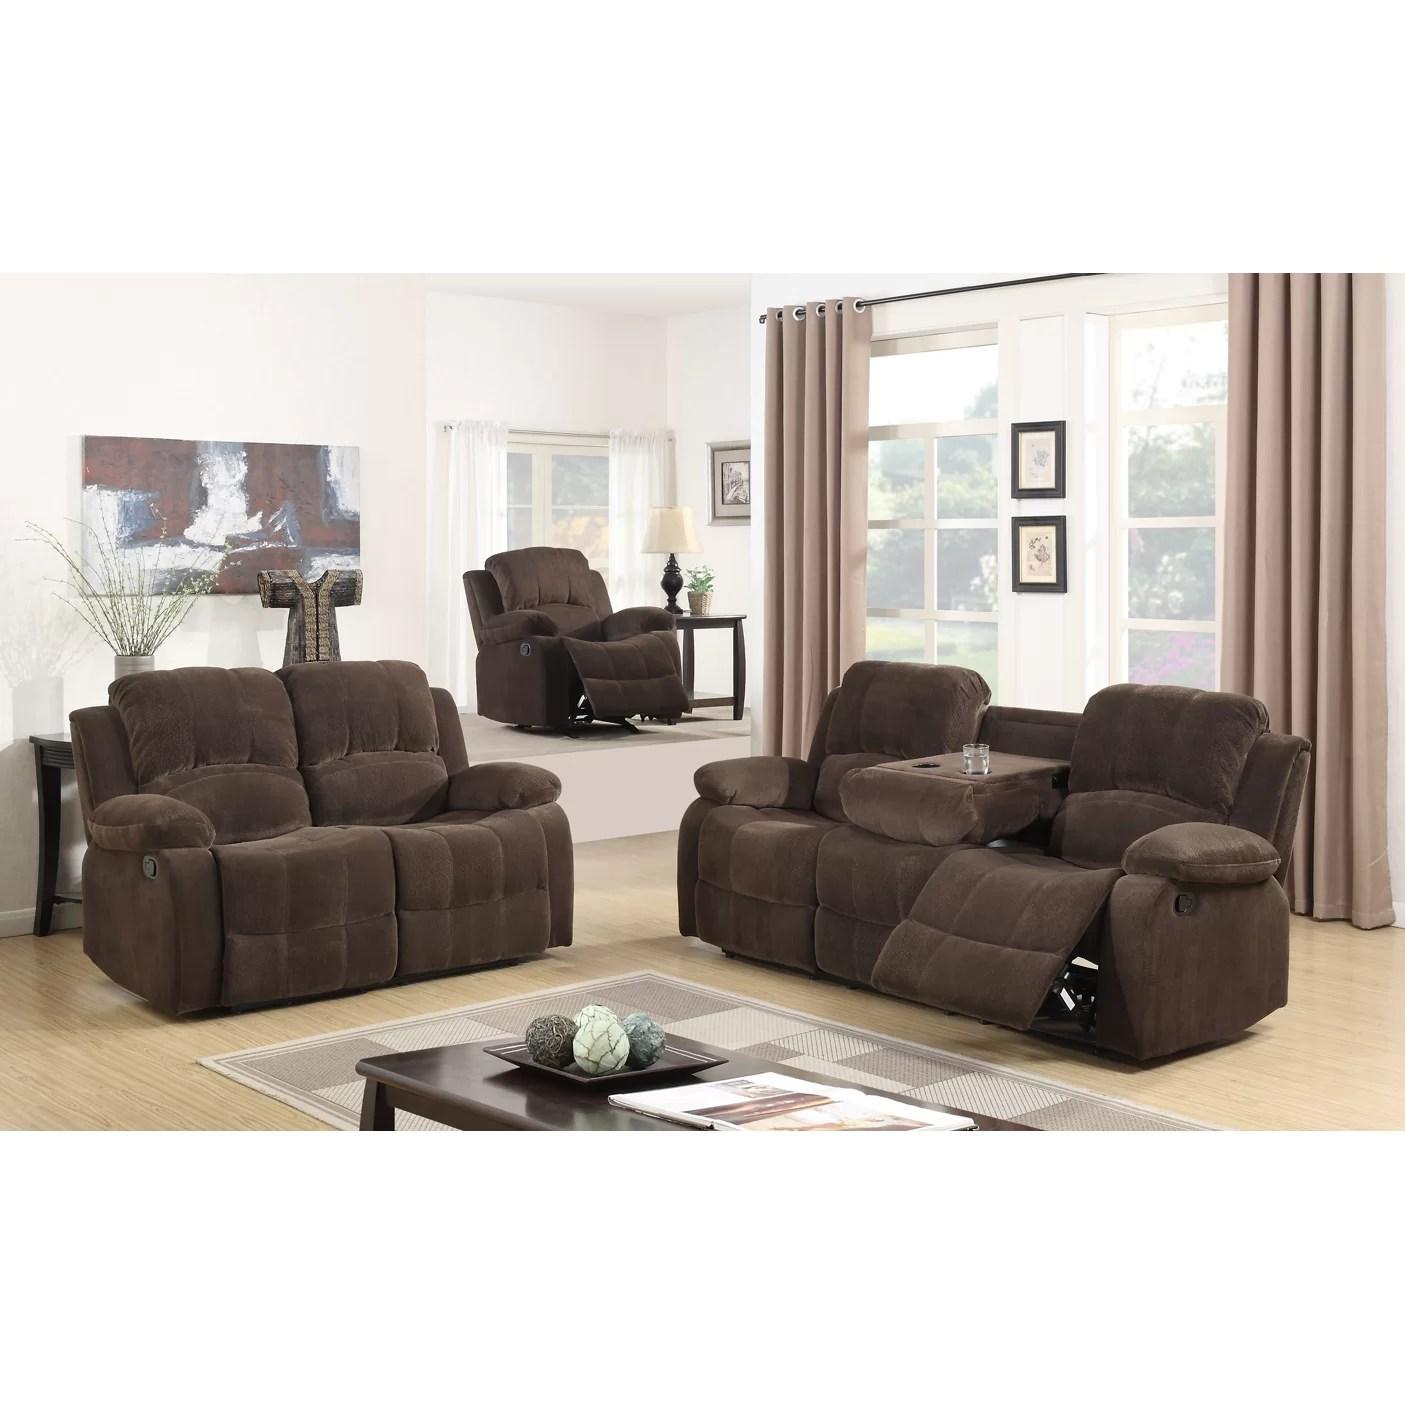 Best Quality Furniture Fabric 3 Piece Recliner Living Room Set  Wayfair